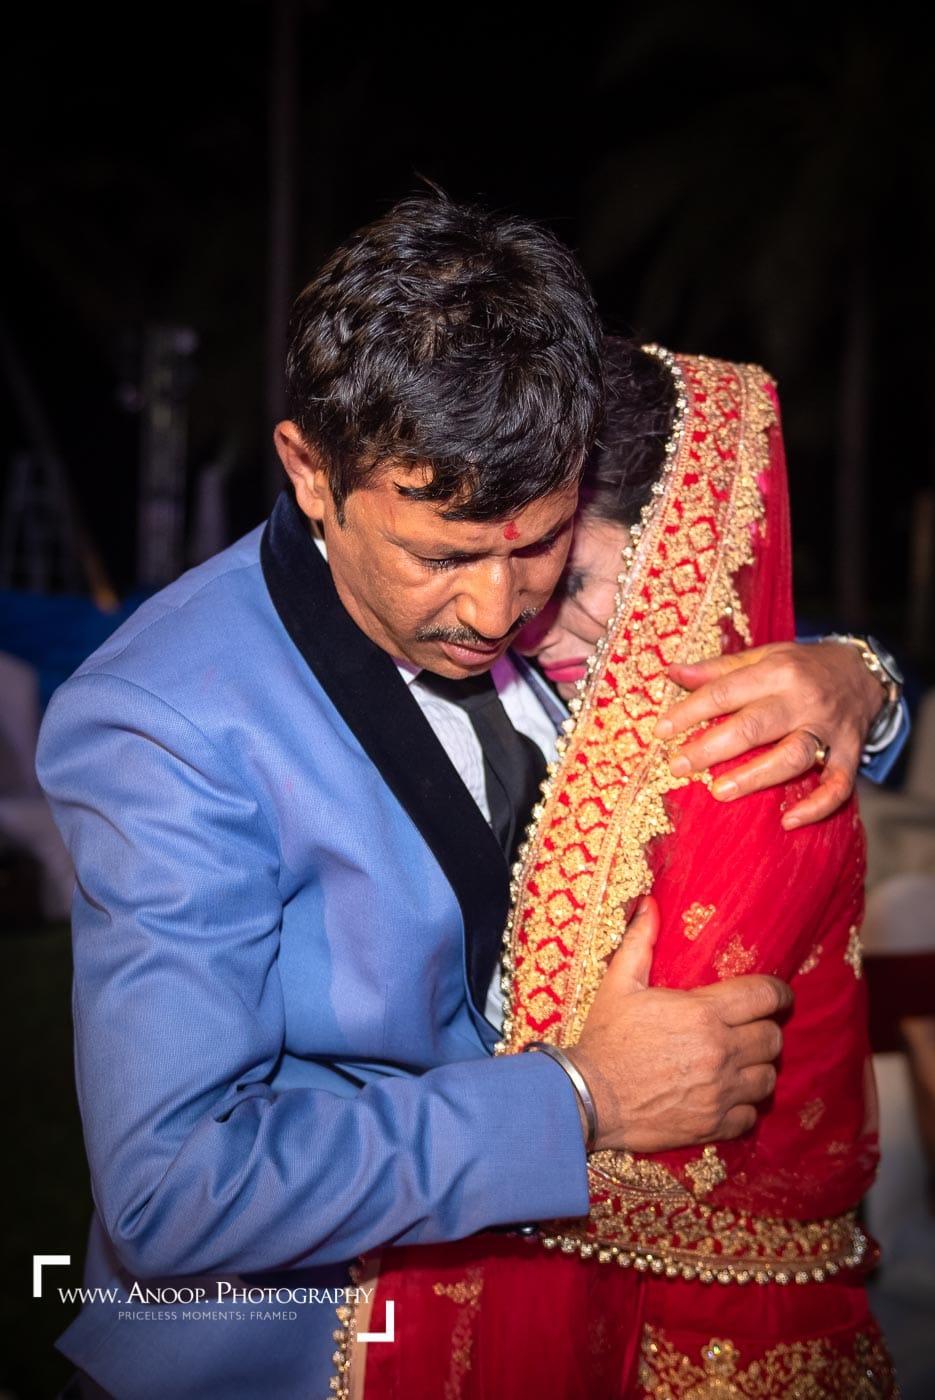 Destination-Nepali-Wedding-in-thailand-sheraton-hua-hin-028